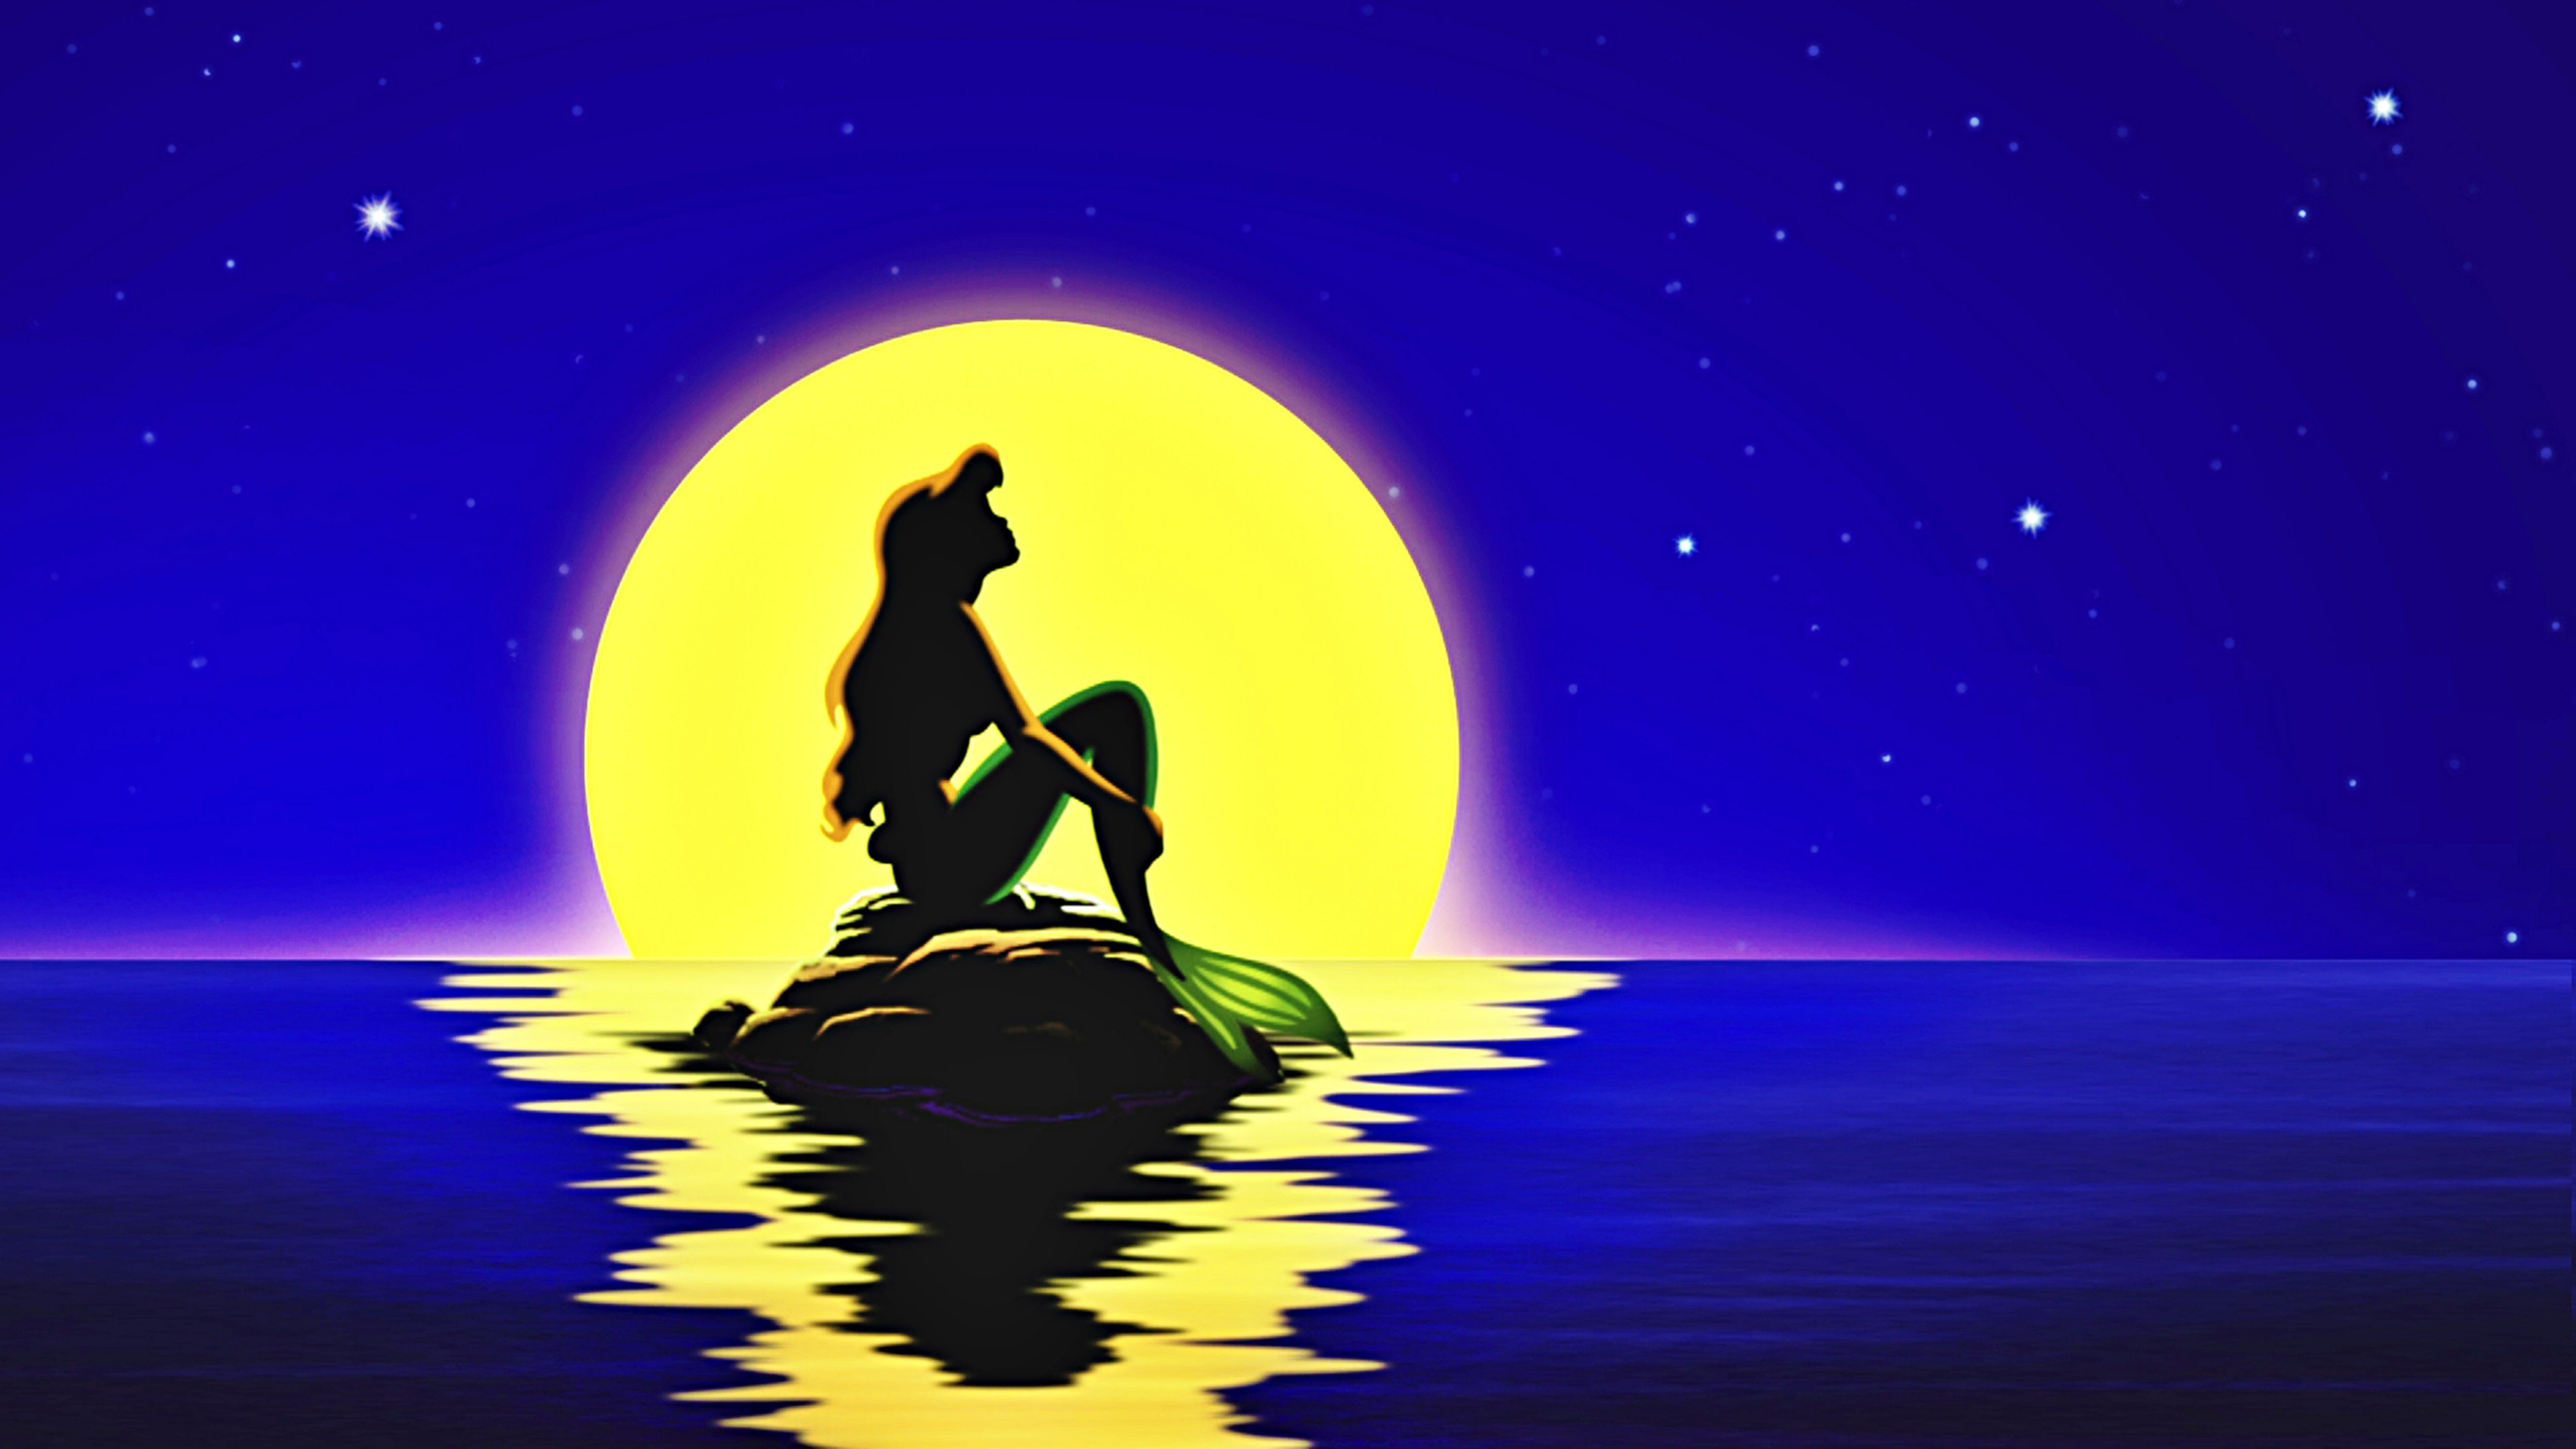 Little Mermaid Wallpapers Top Free Little Mermaid Backgrounds